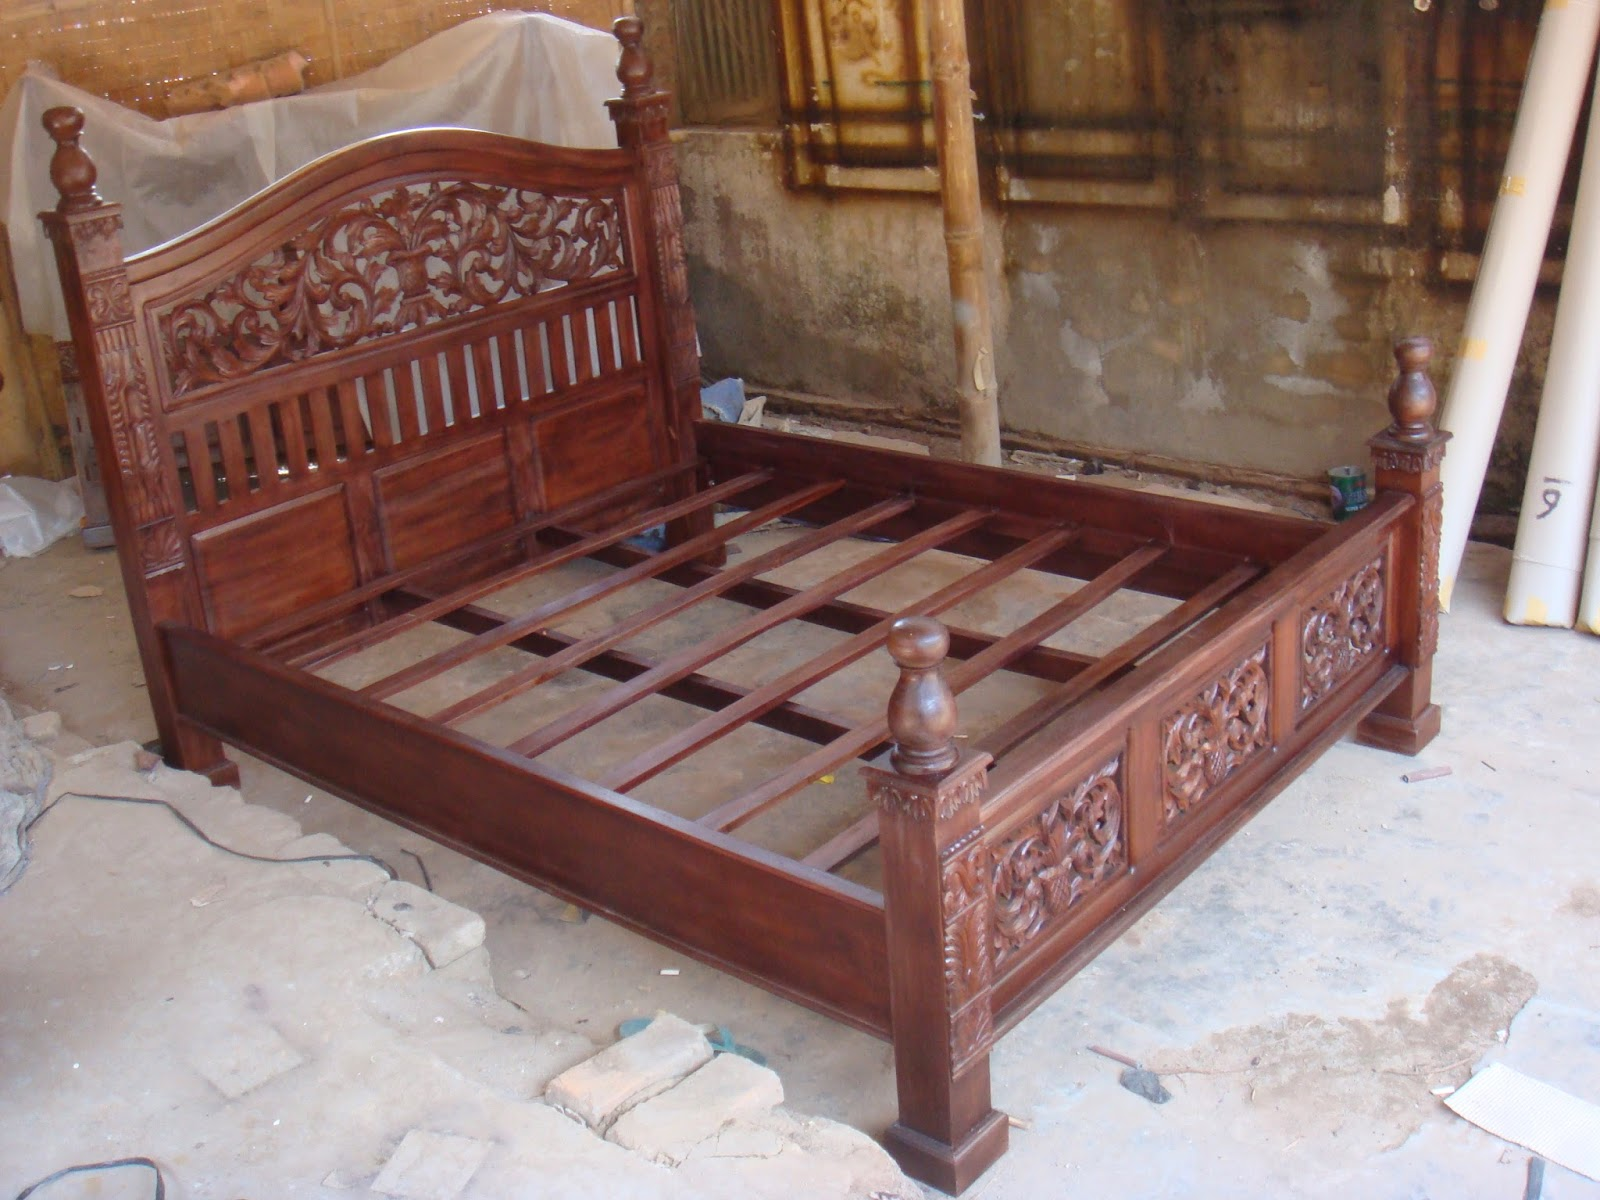 carving+bed.JPG